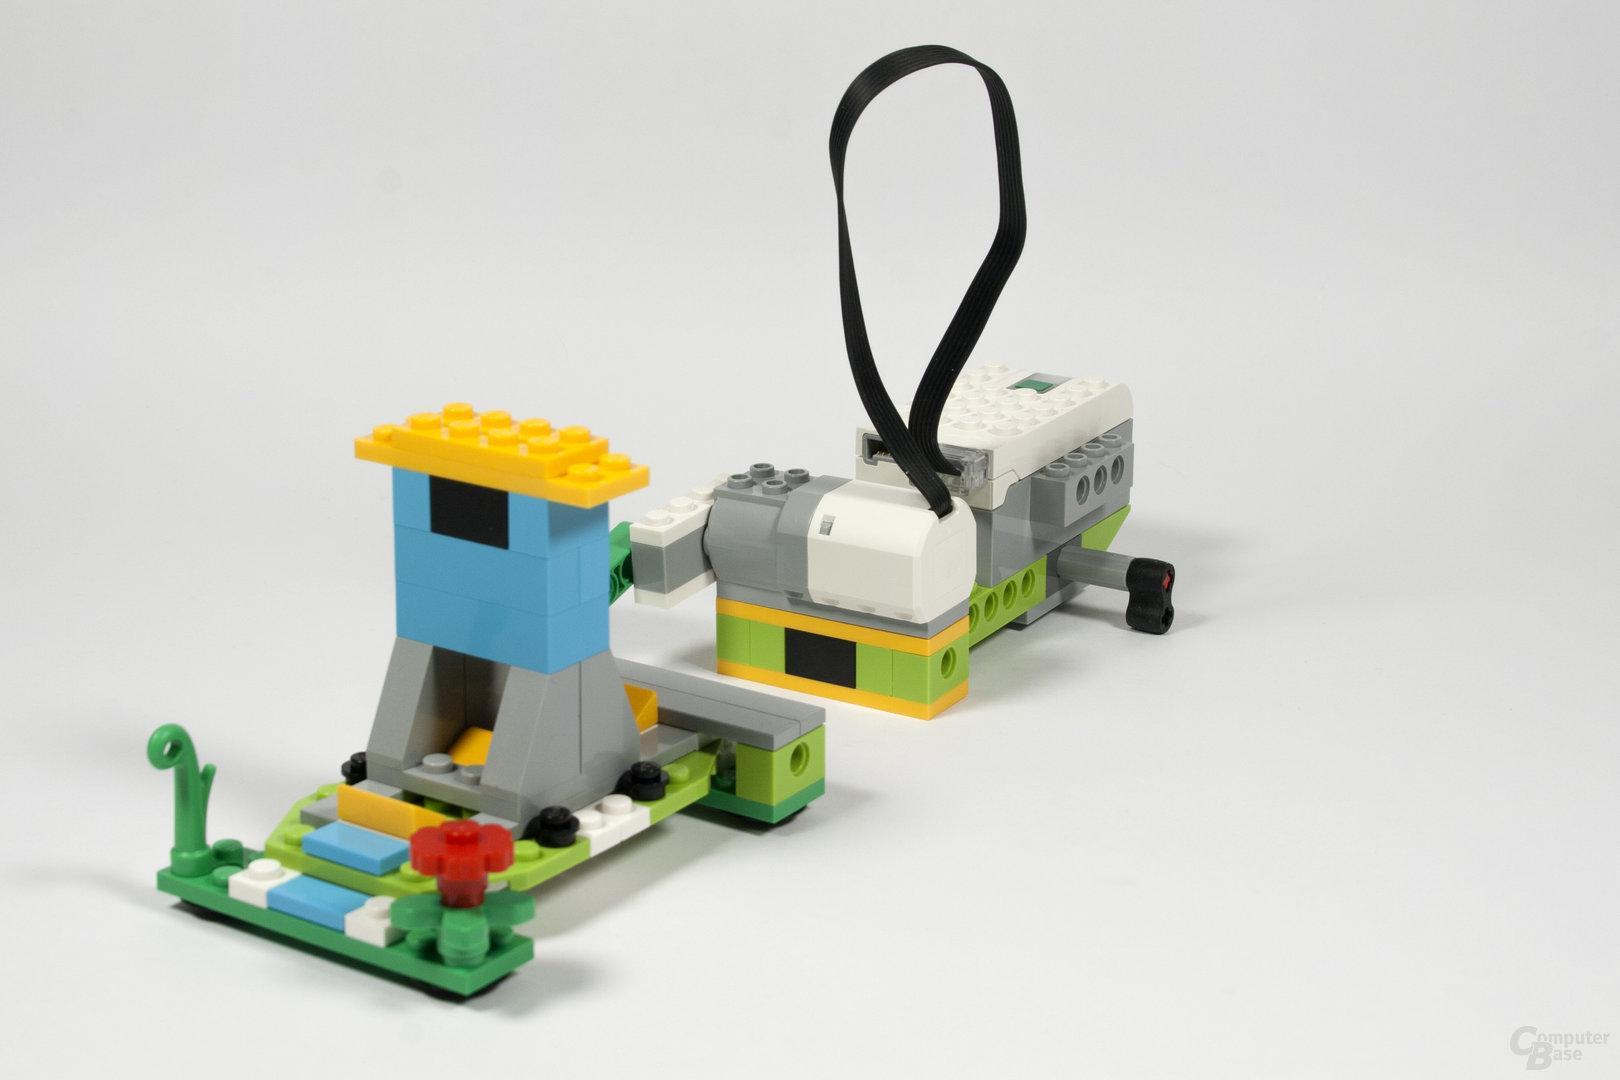 Lego WeDo 2.0 – Standfestigkeit